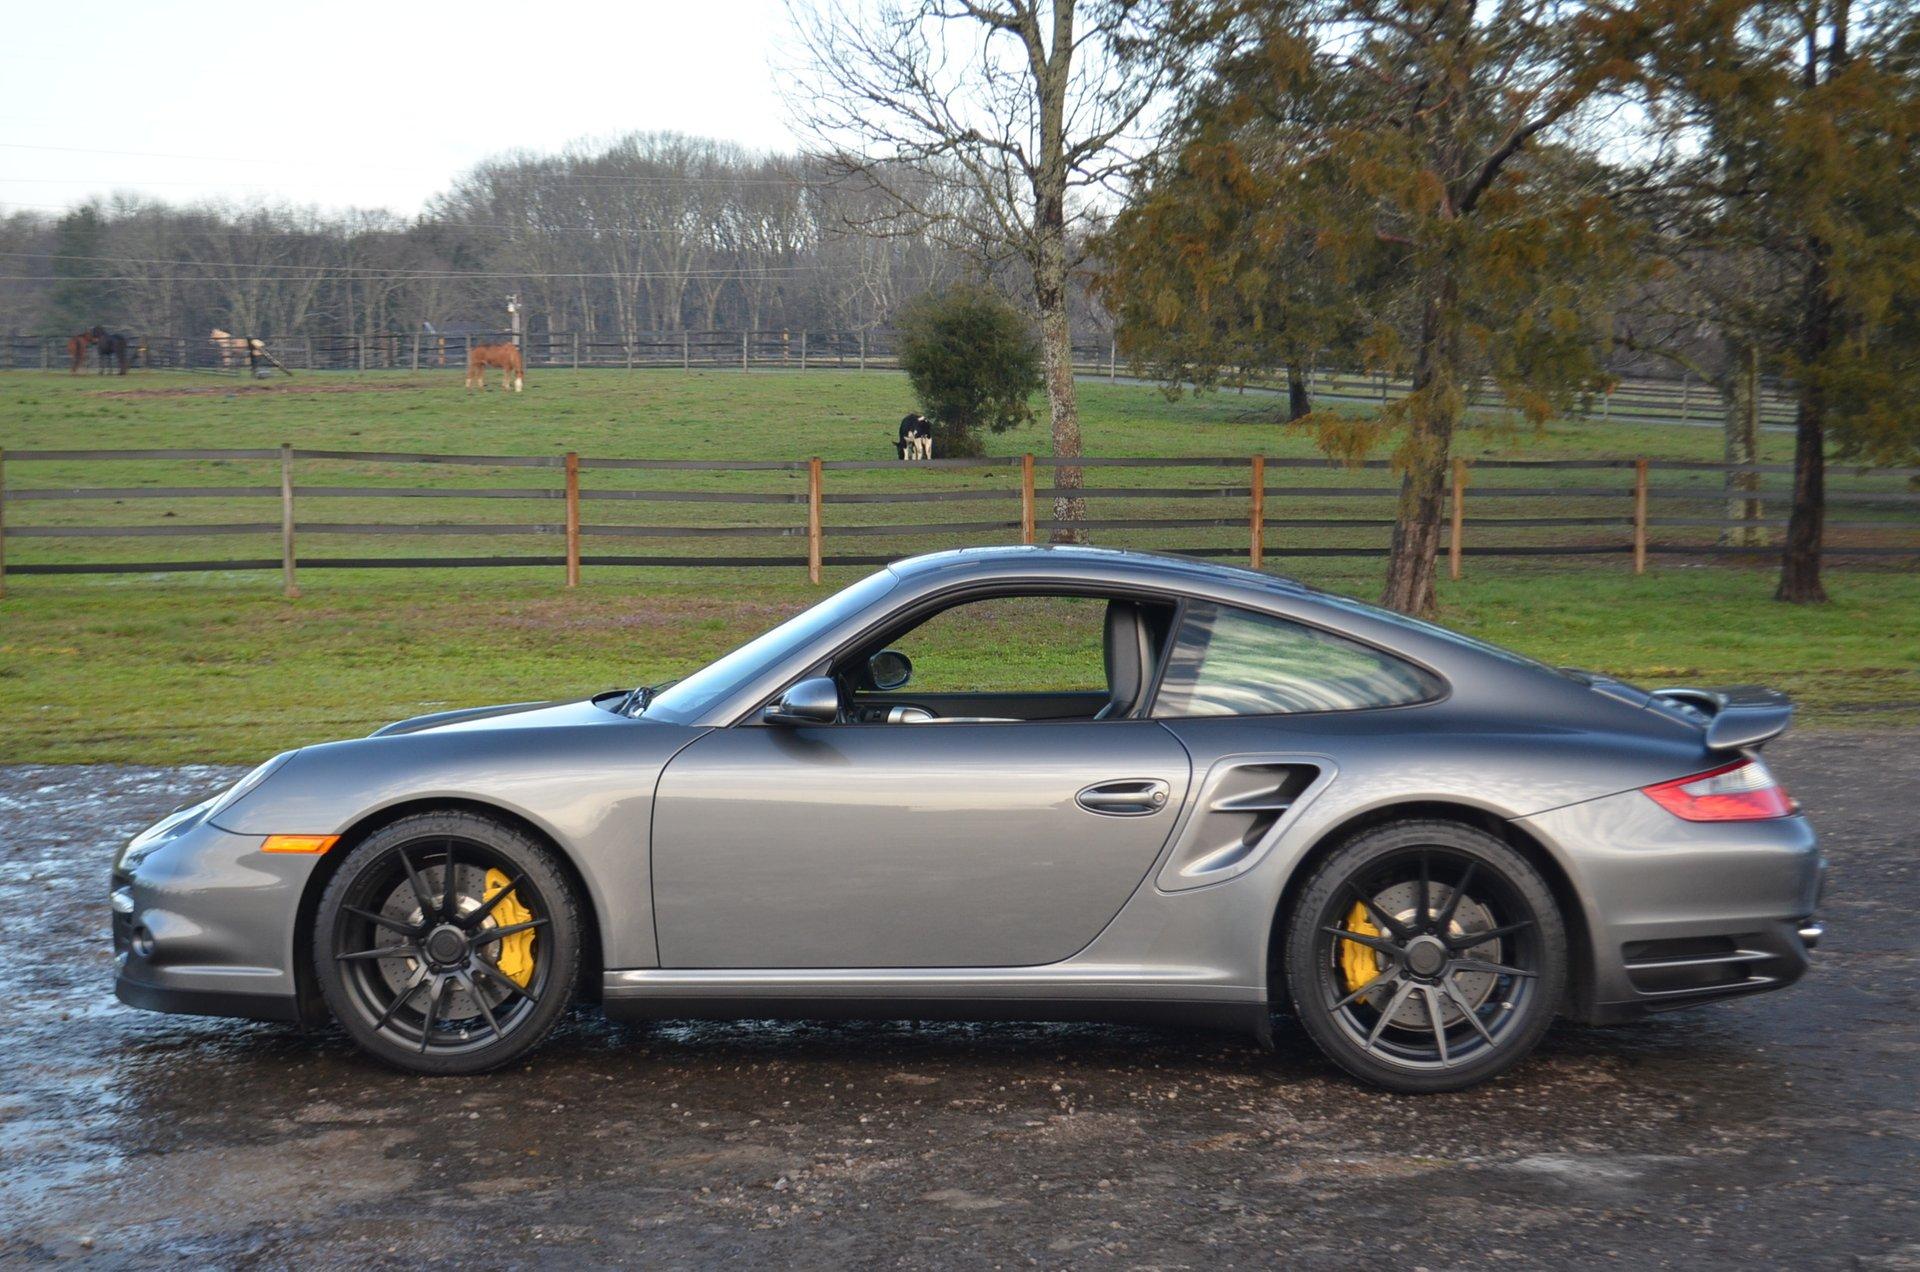 Porsche 997 Turbo >> 2007 Porsche 997 Turbo Frazier Motorcar Company